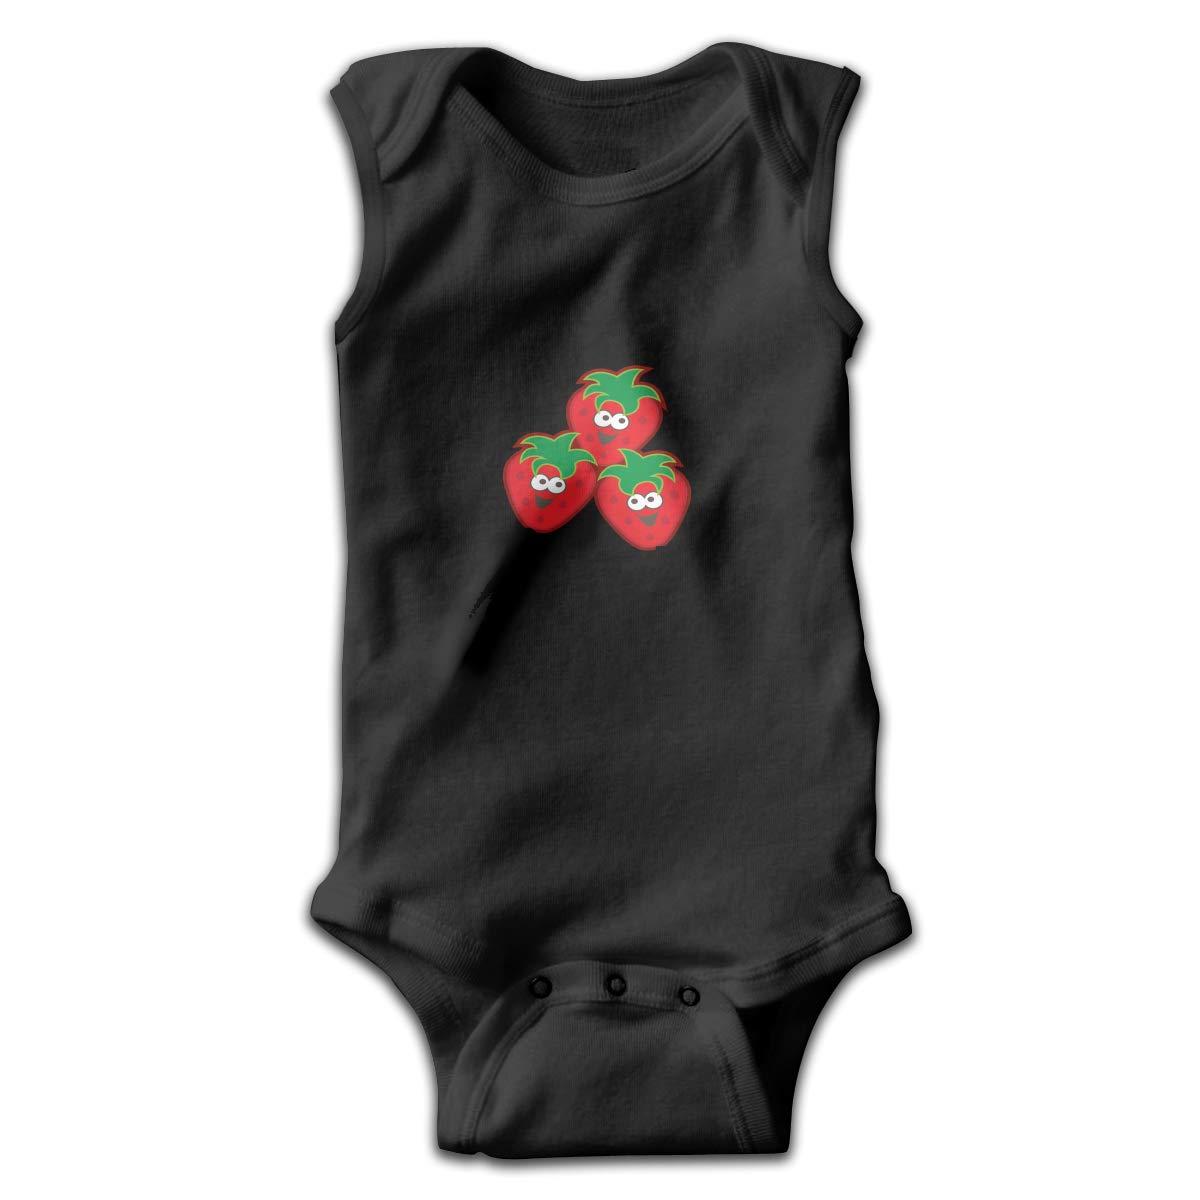 Efbj Newborn Baby Boys Rompers Sleeveless Cotton Onesie,Strawberry Social Outfit Spring Pajamas